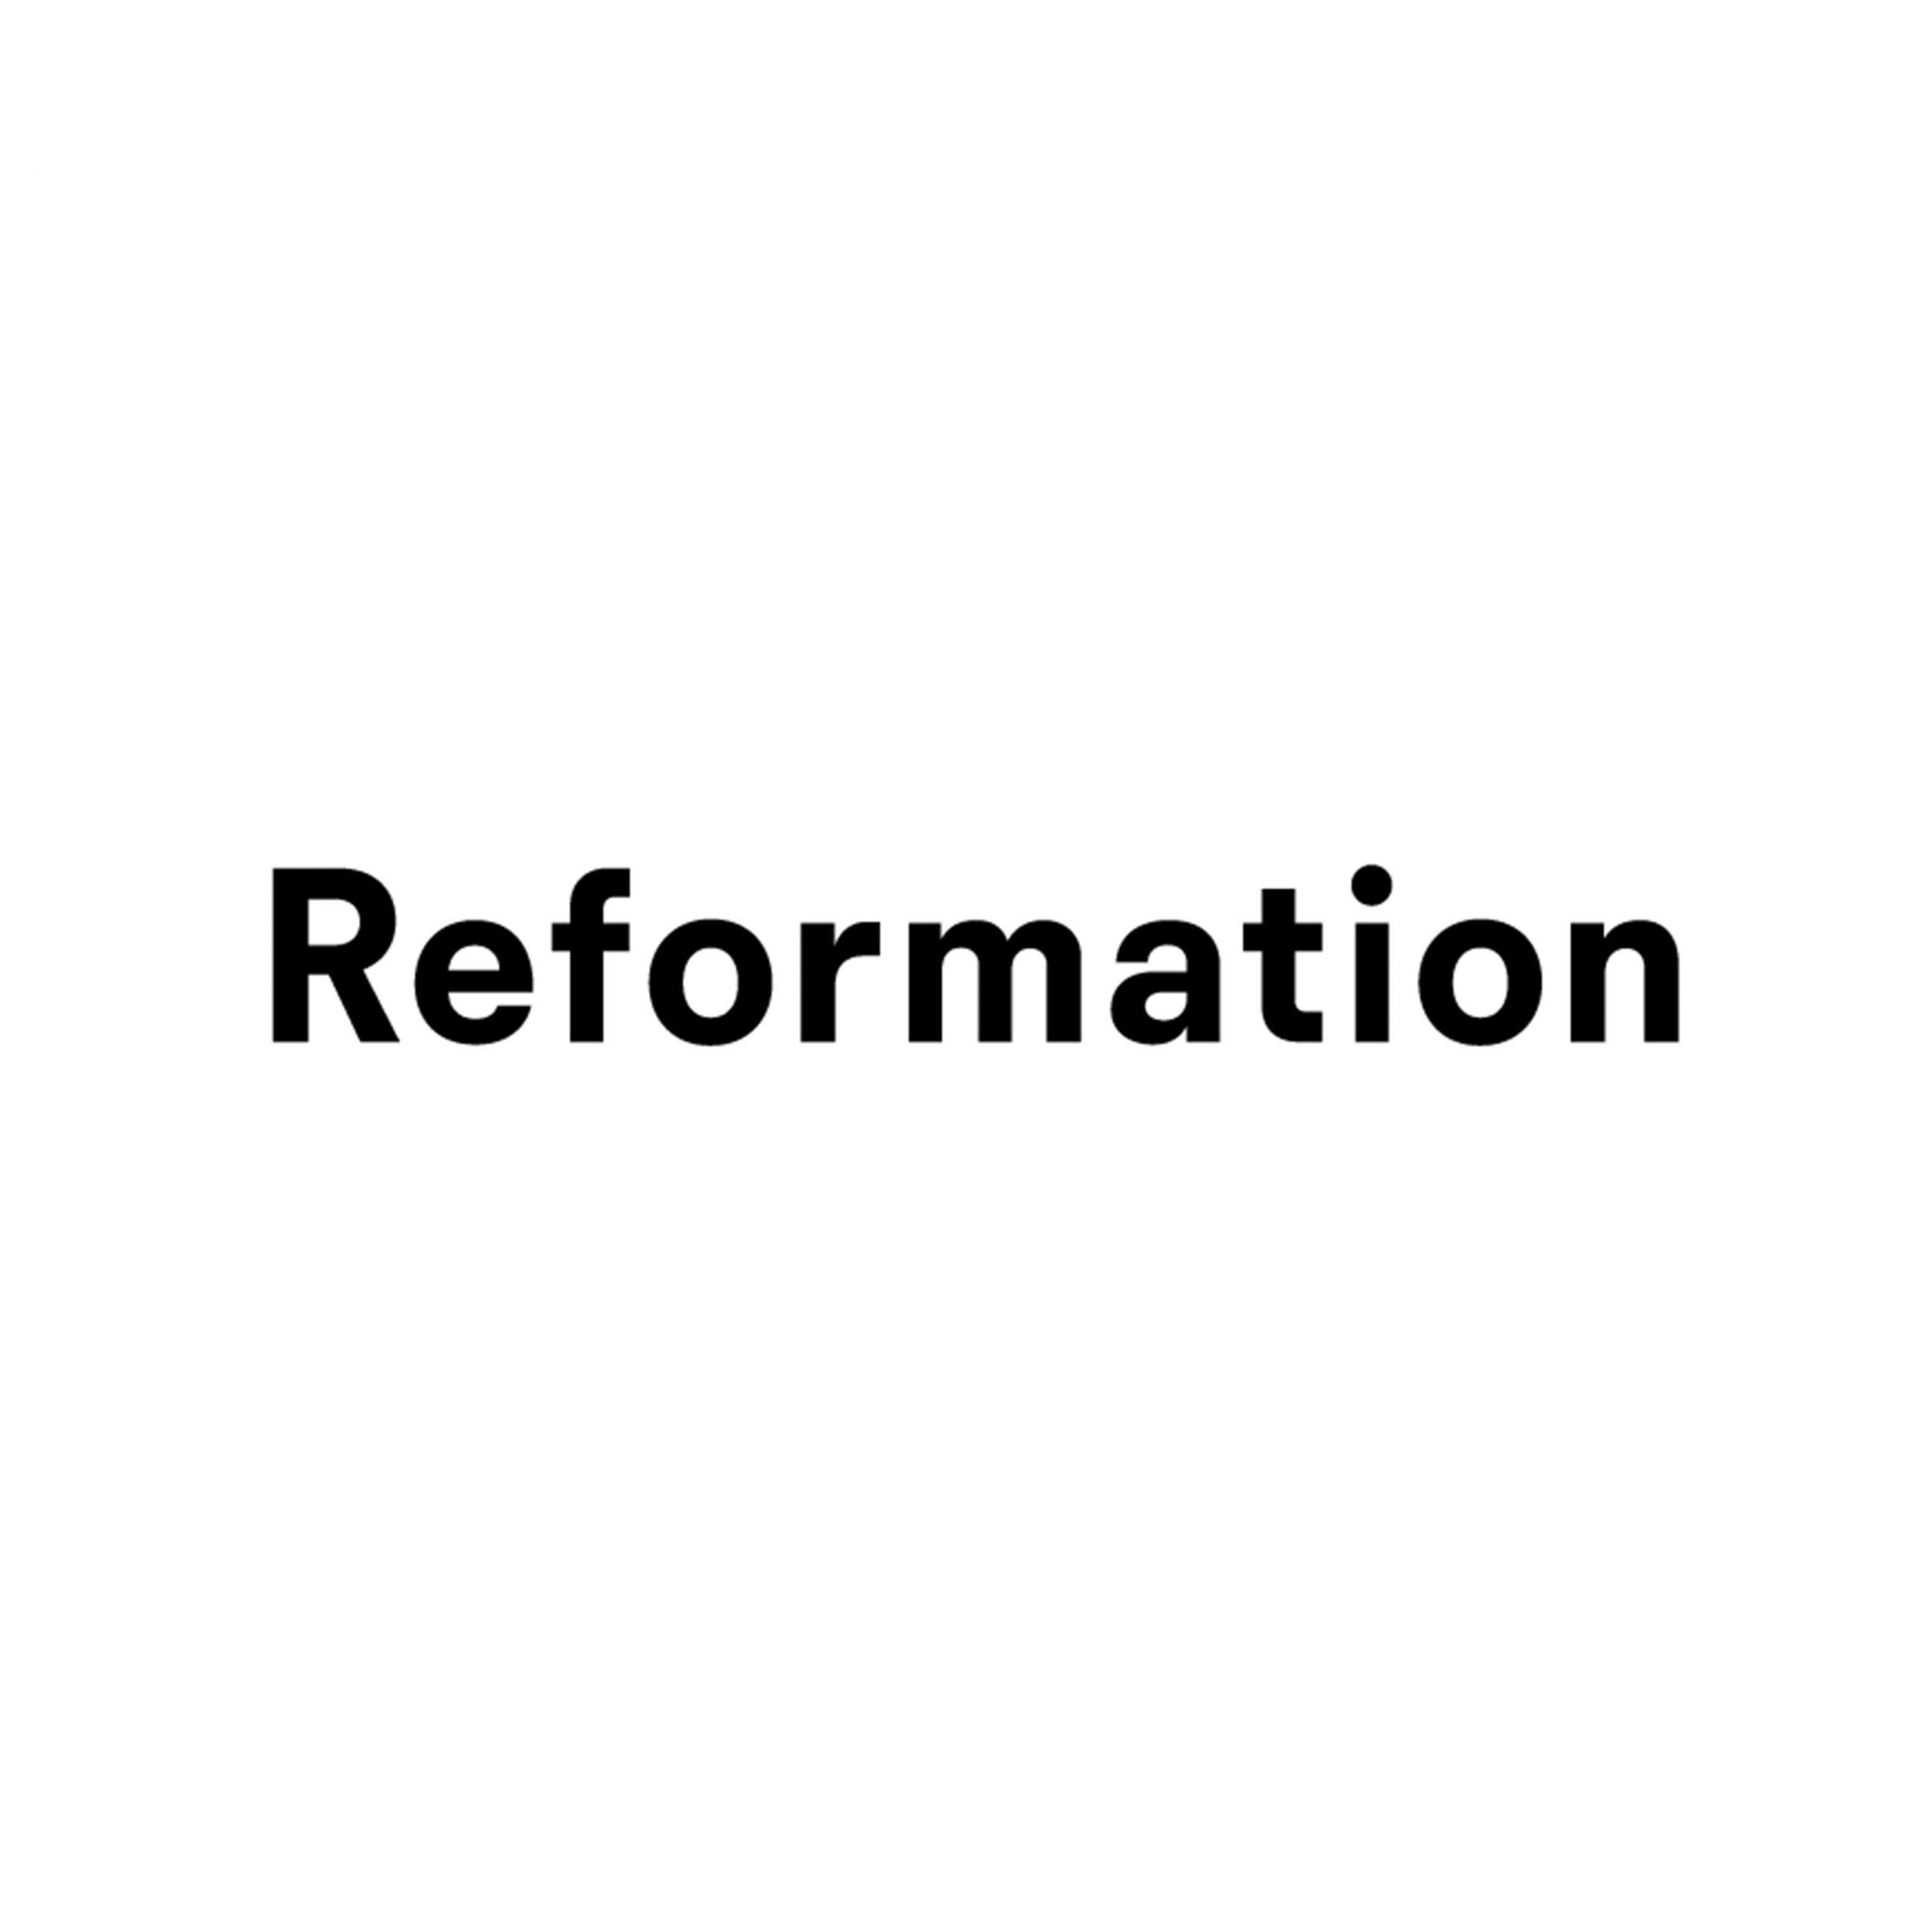 Logo_reformation